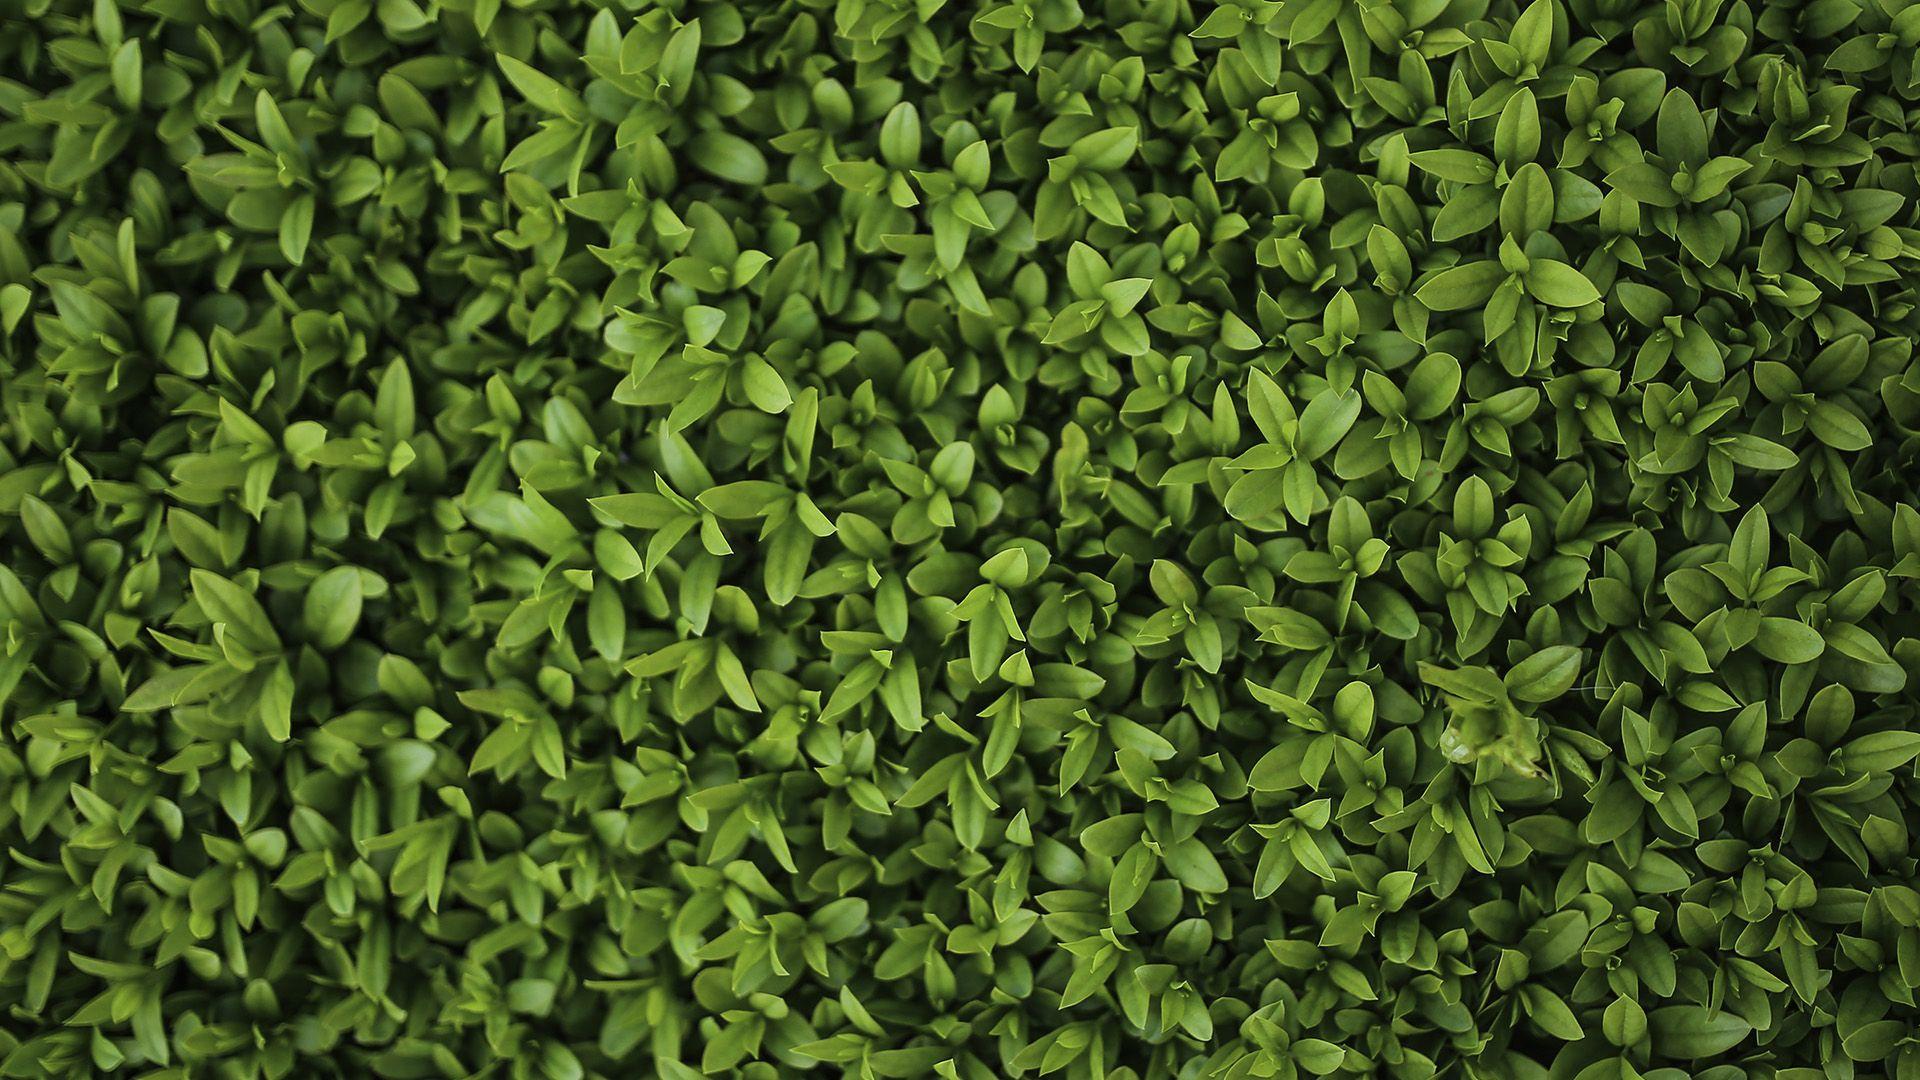 Leaf Pattern good wallpaper hd